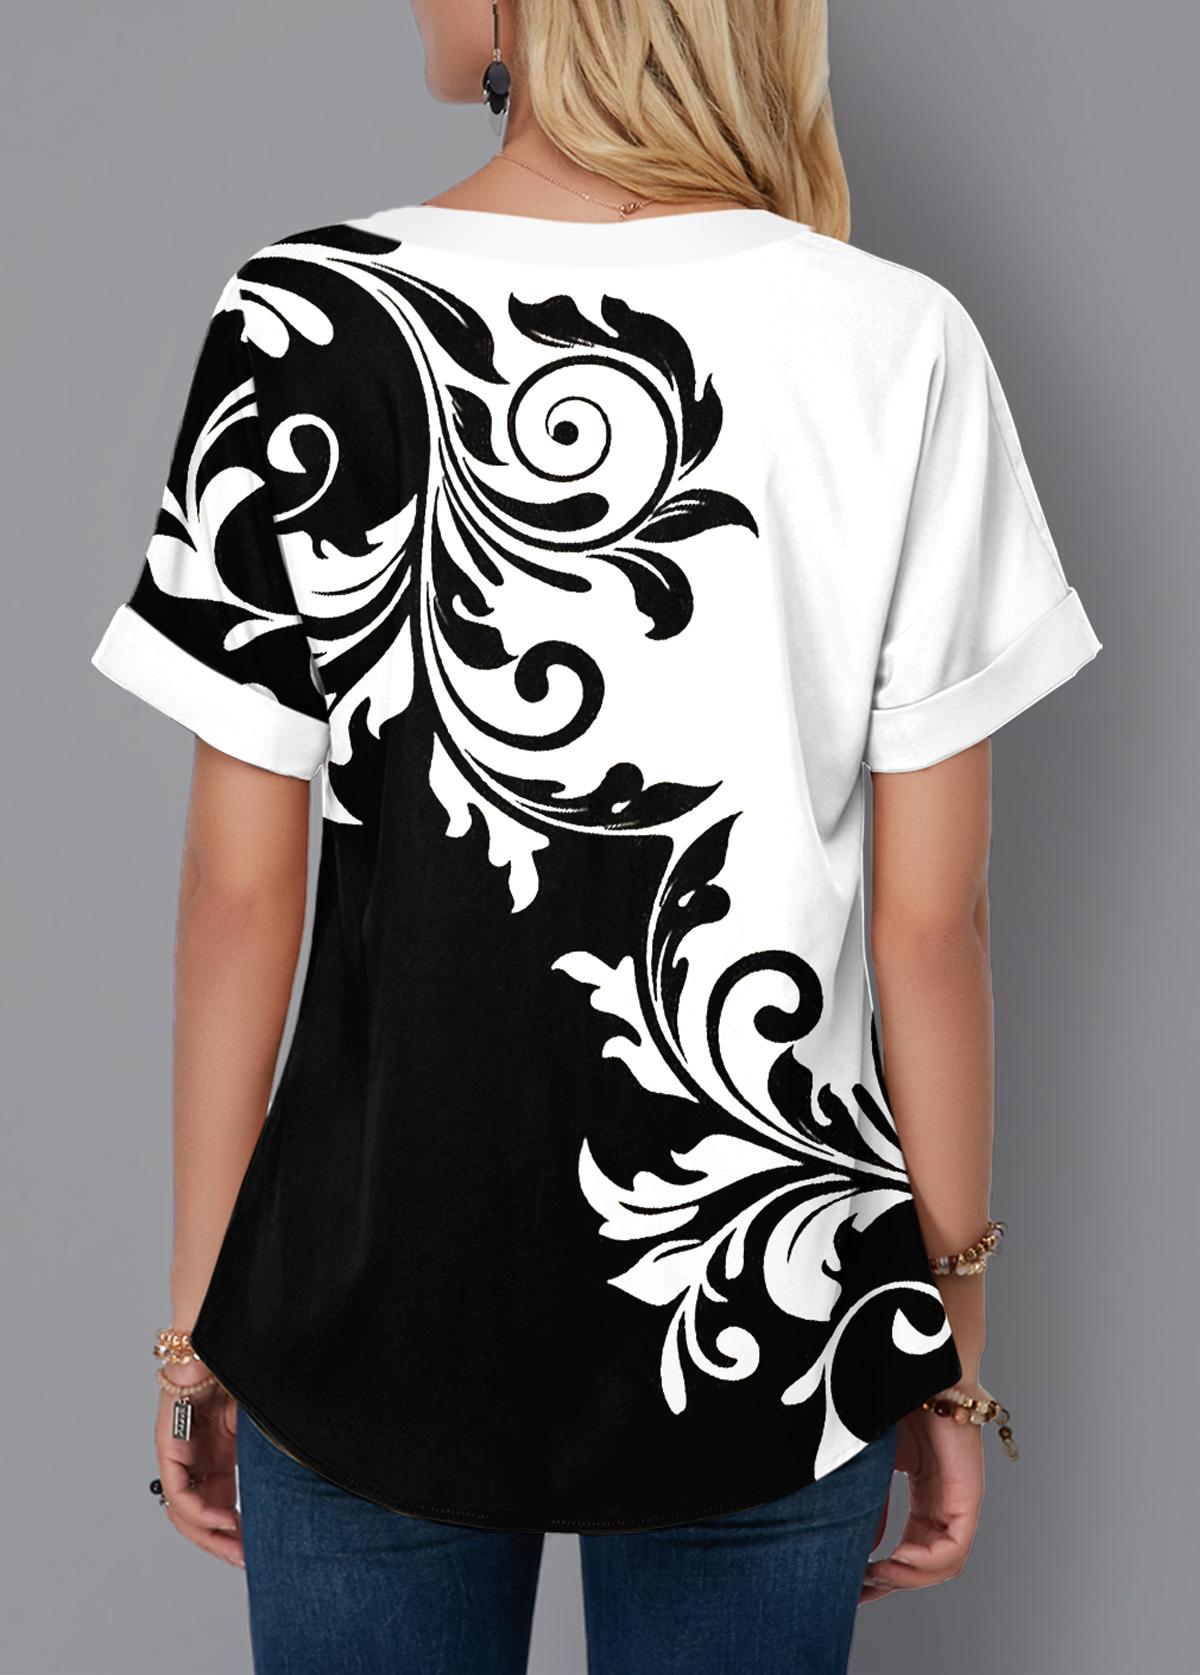 Lace Up Tribal Print Color Block Blouse